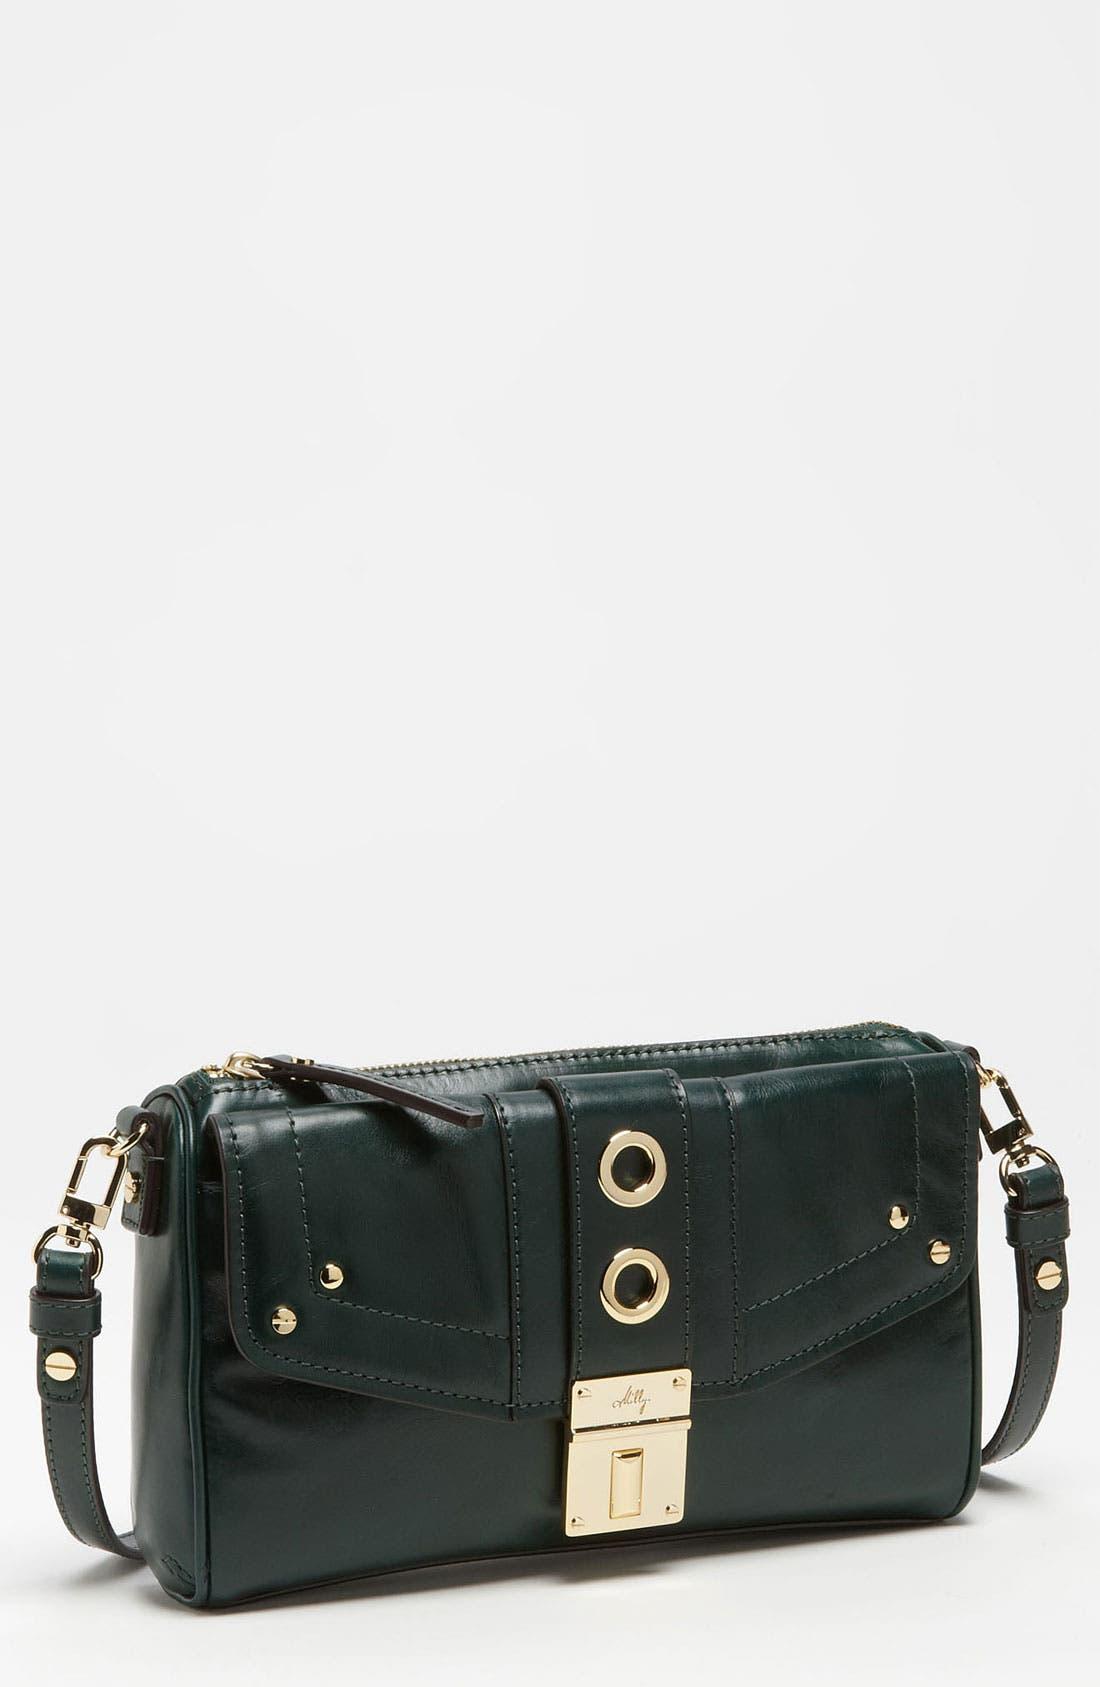 Main Image - Milly 'Harper' Camera Bag